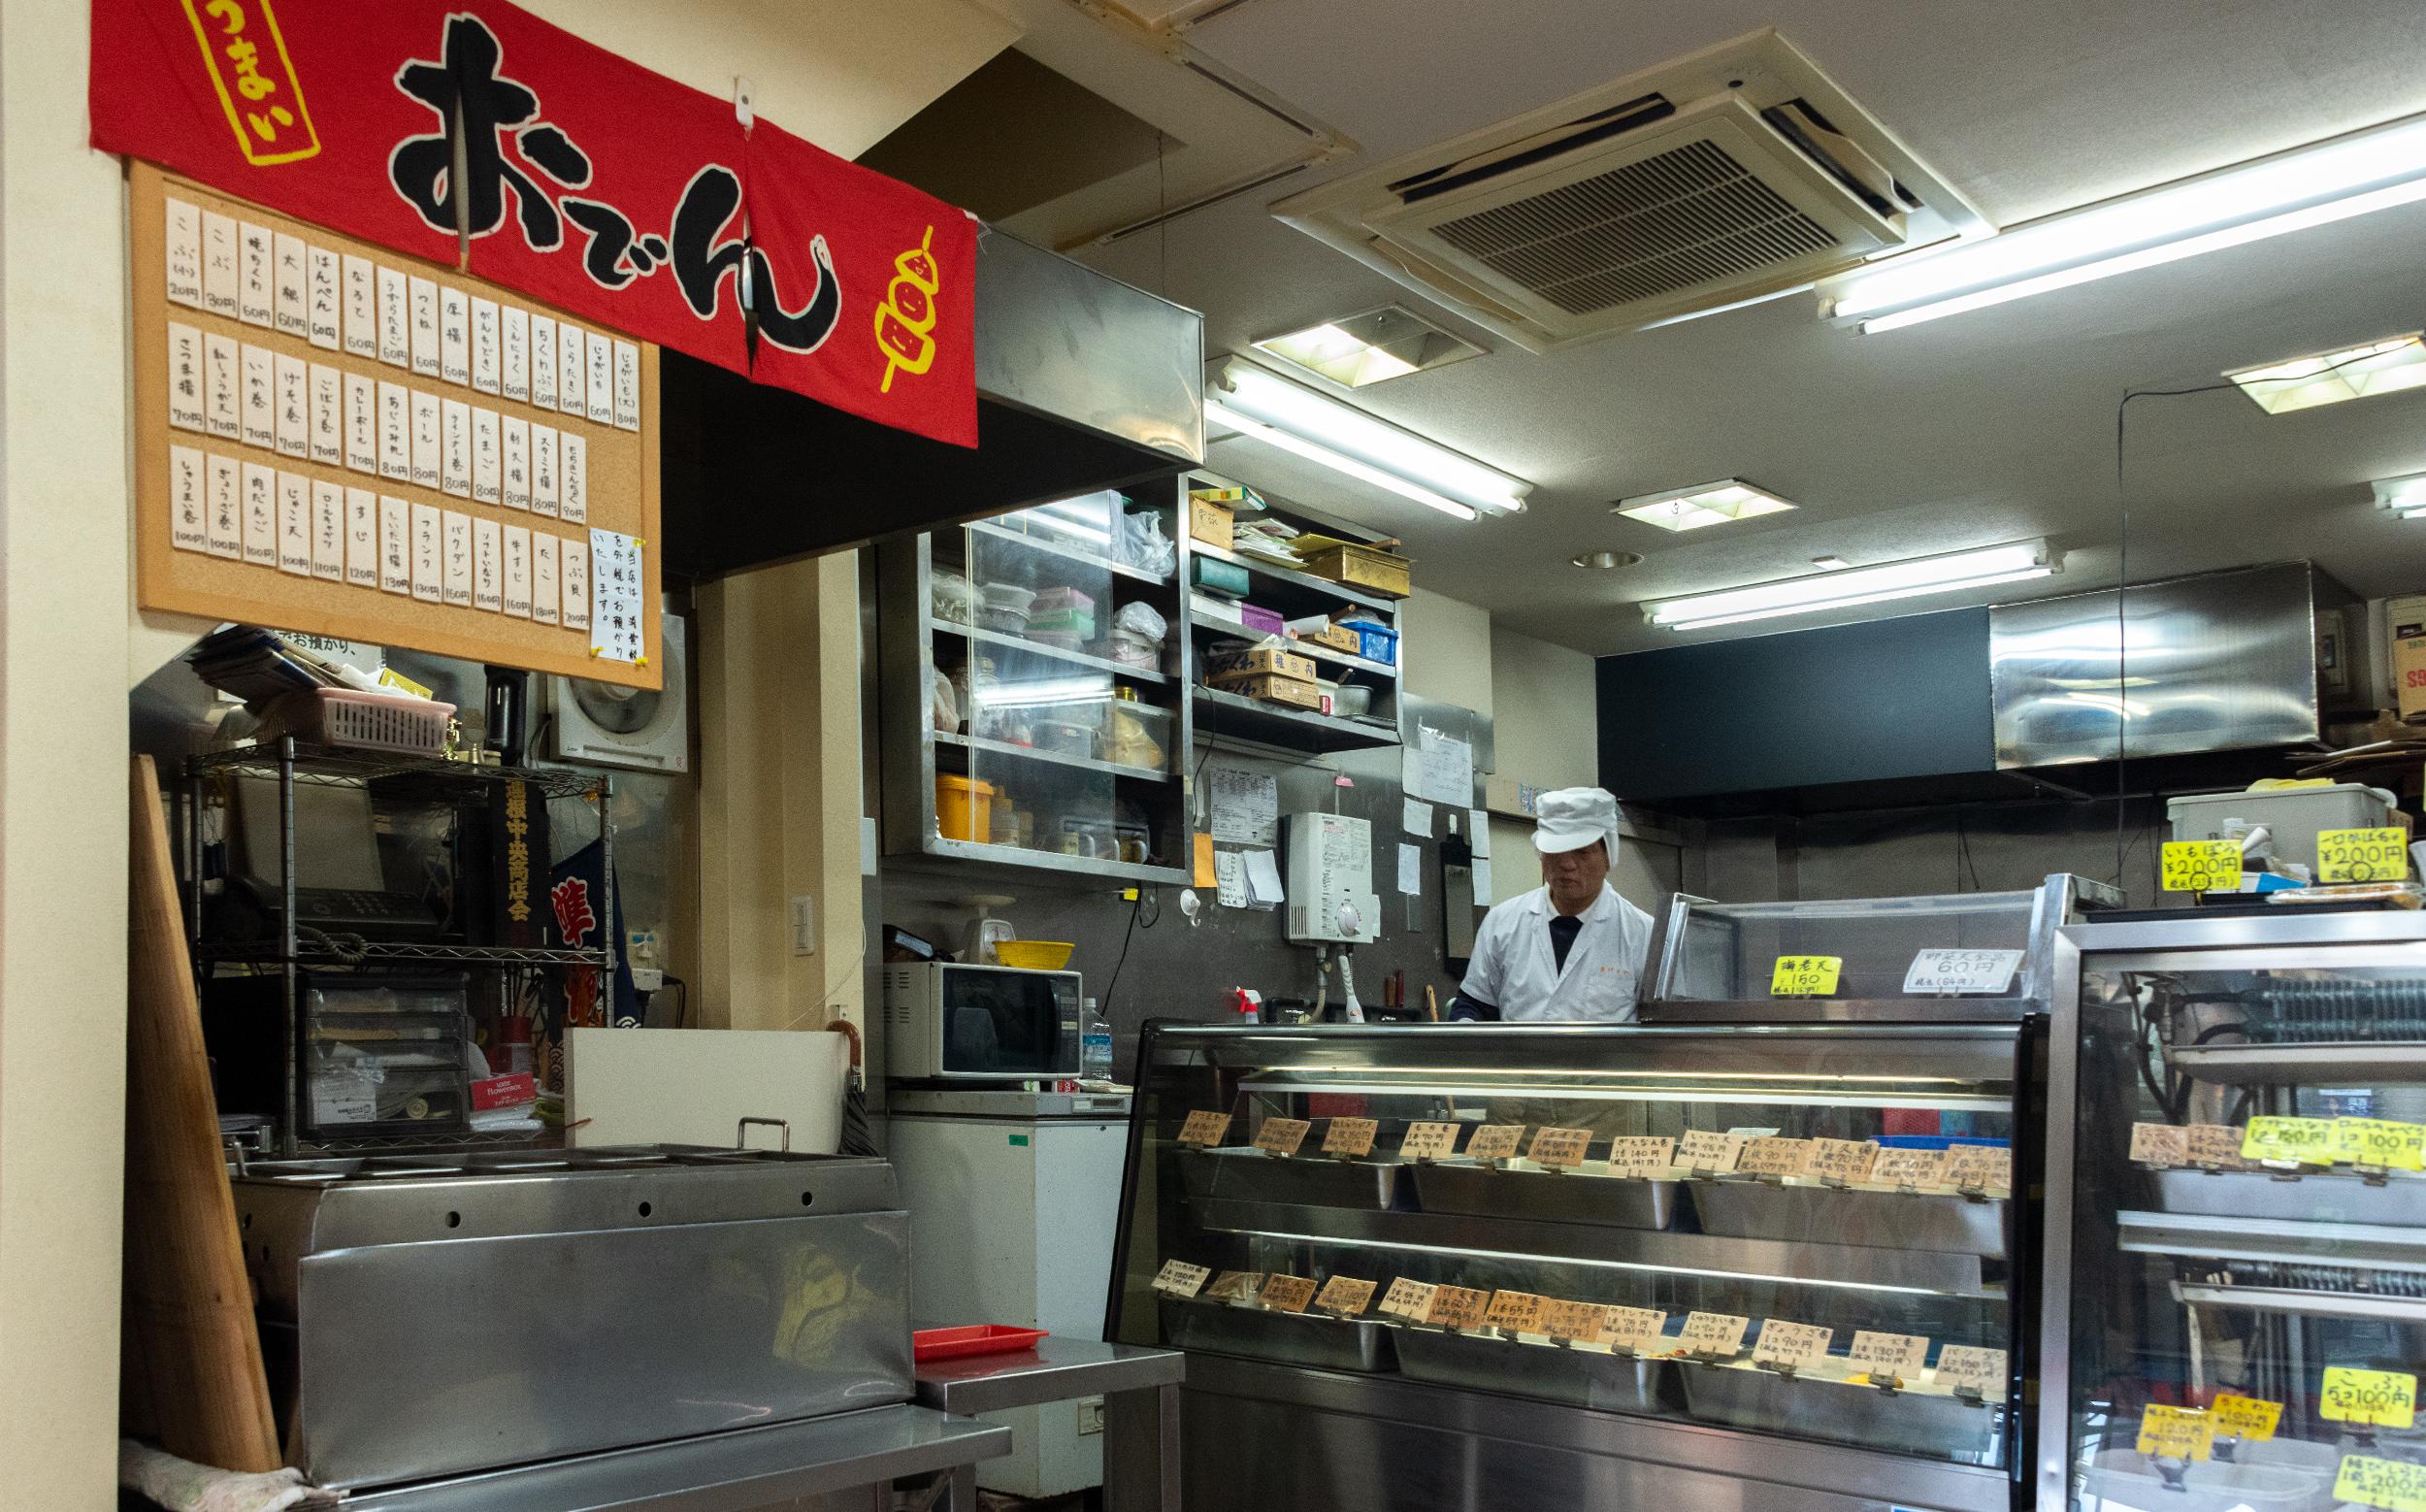 東京都板橋区蓮根 蓮根中央商店会:えびすや蒲鉾店